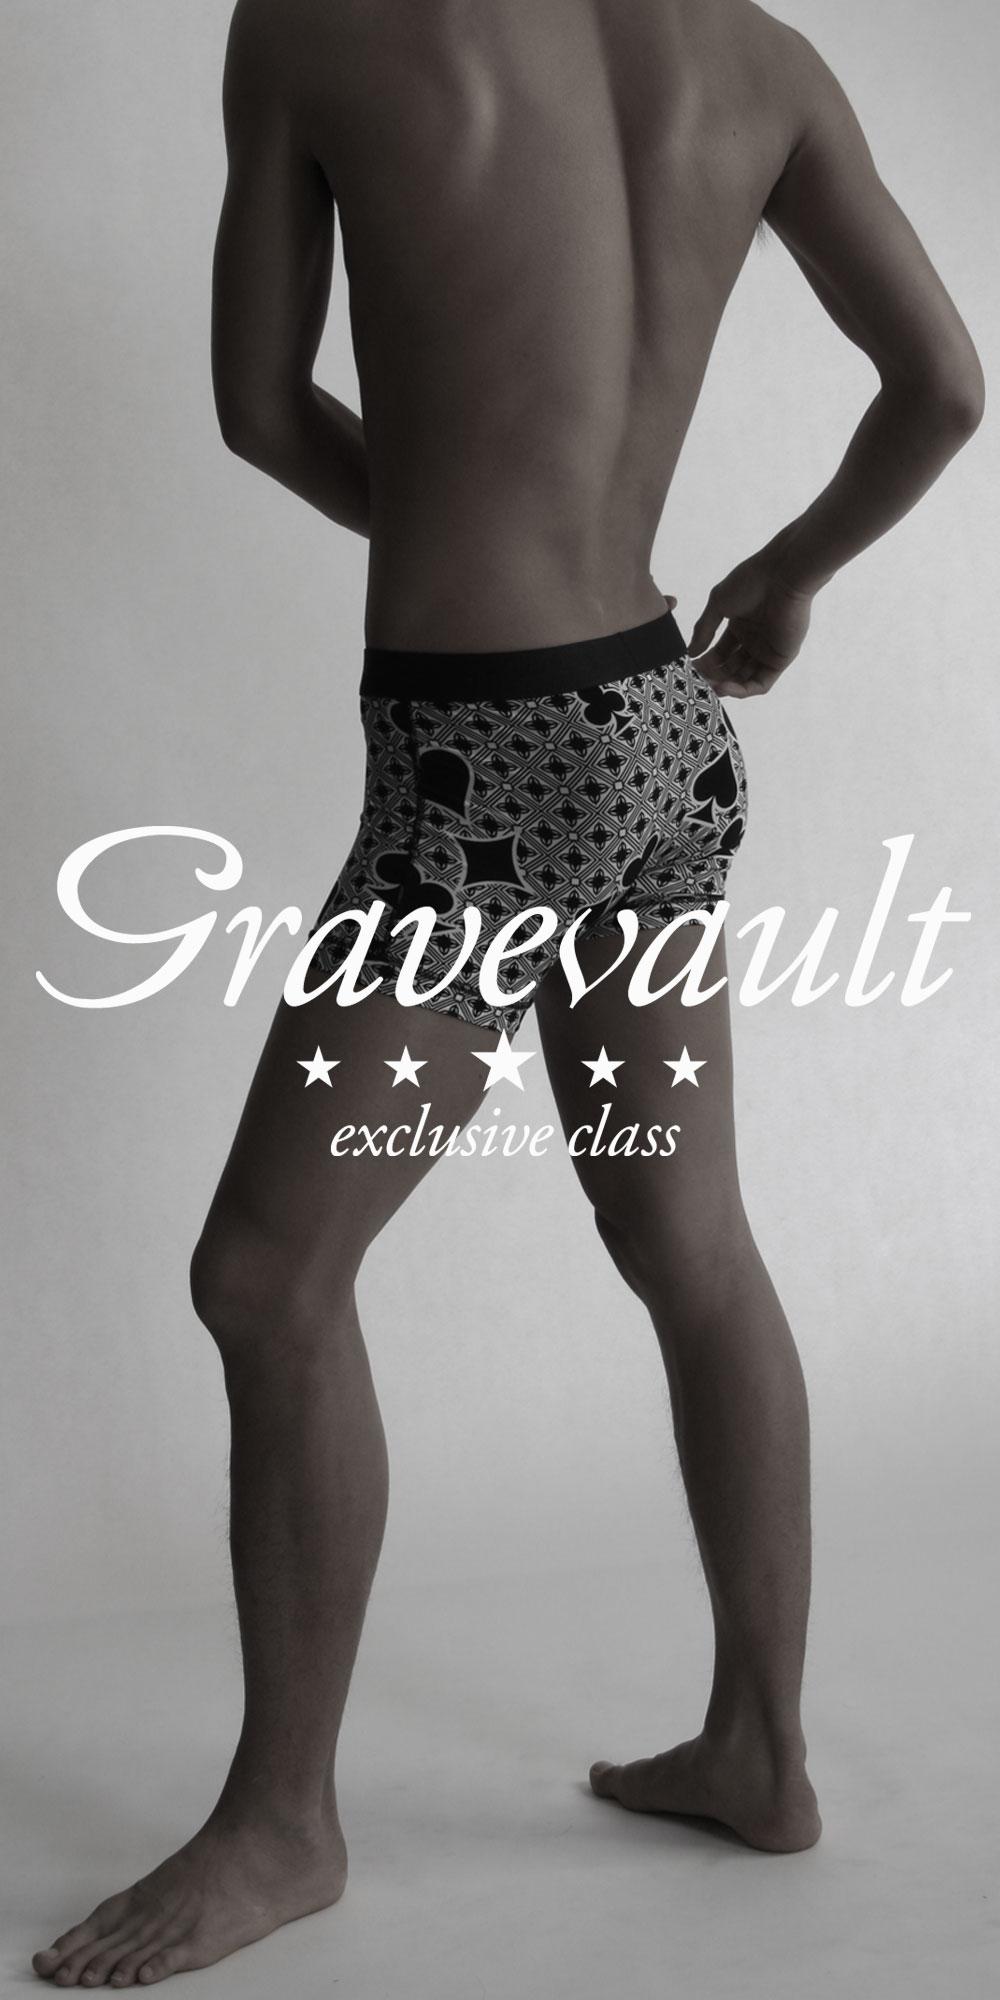 gravevault_1